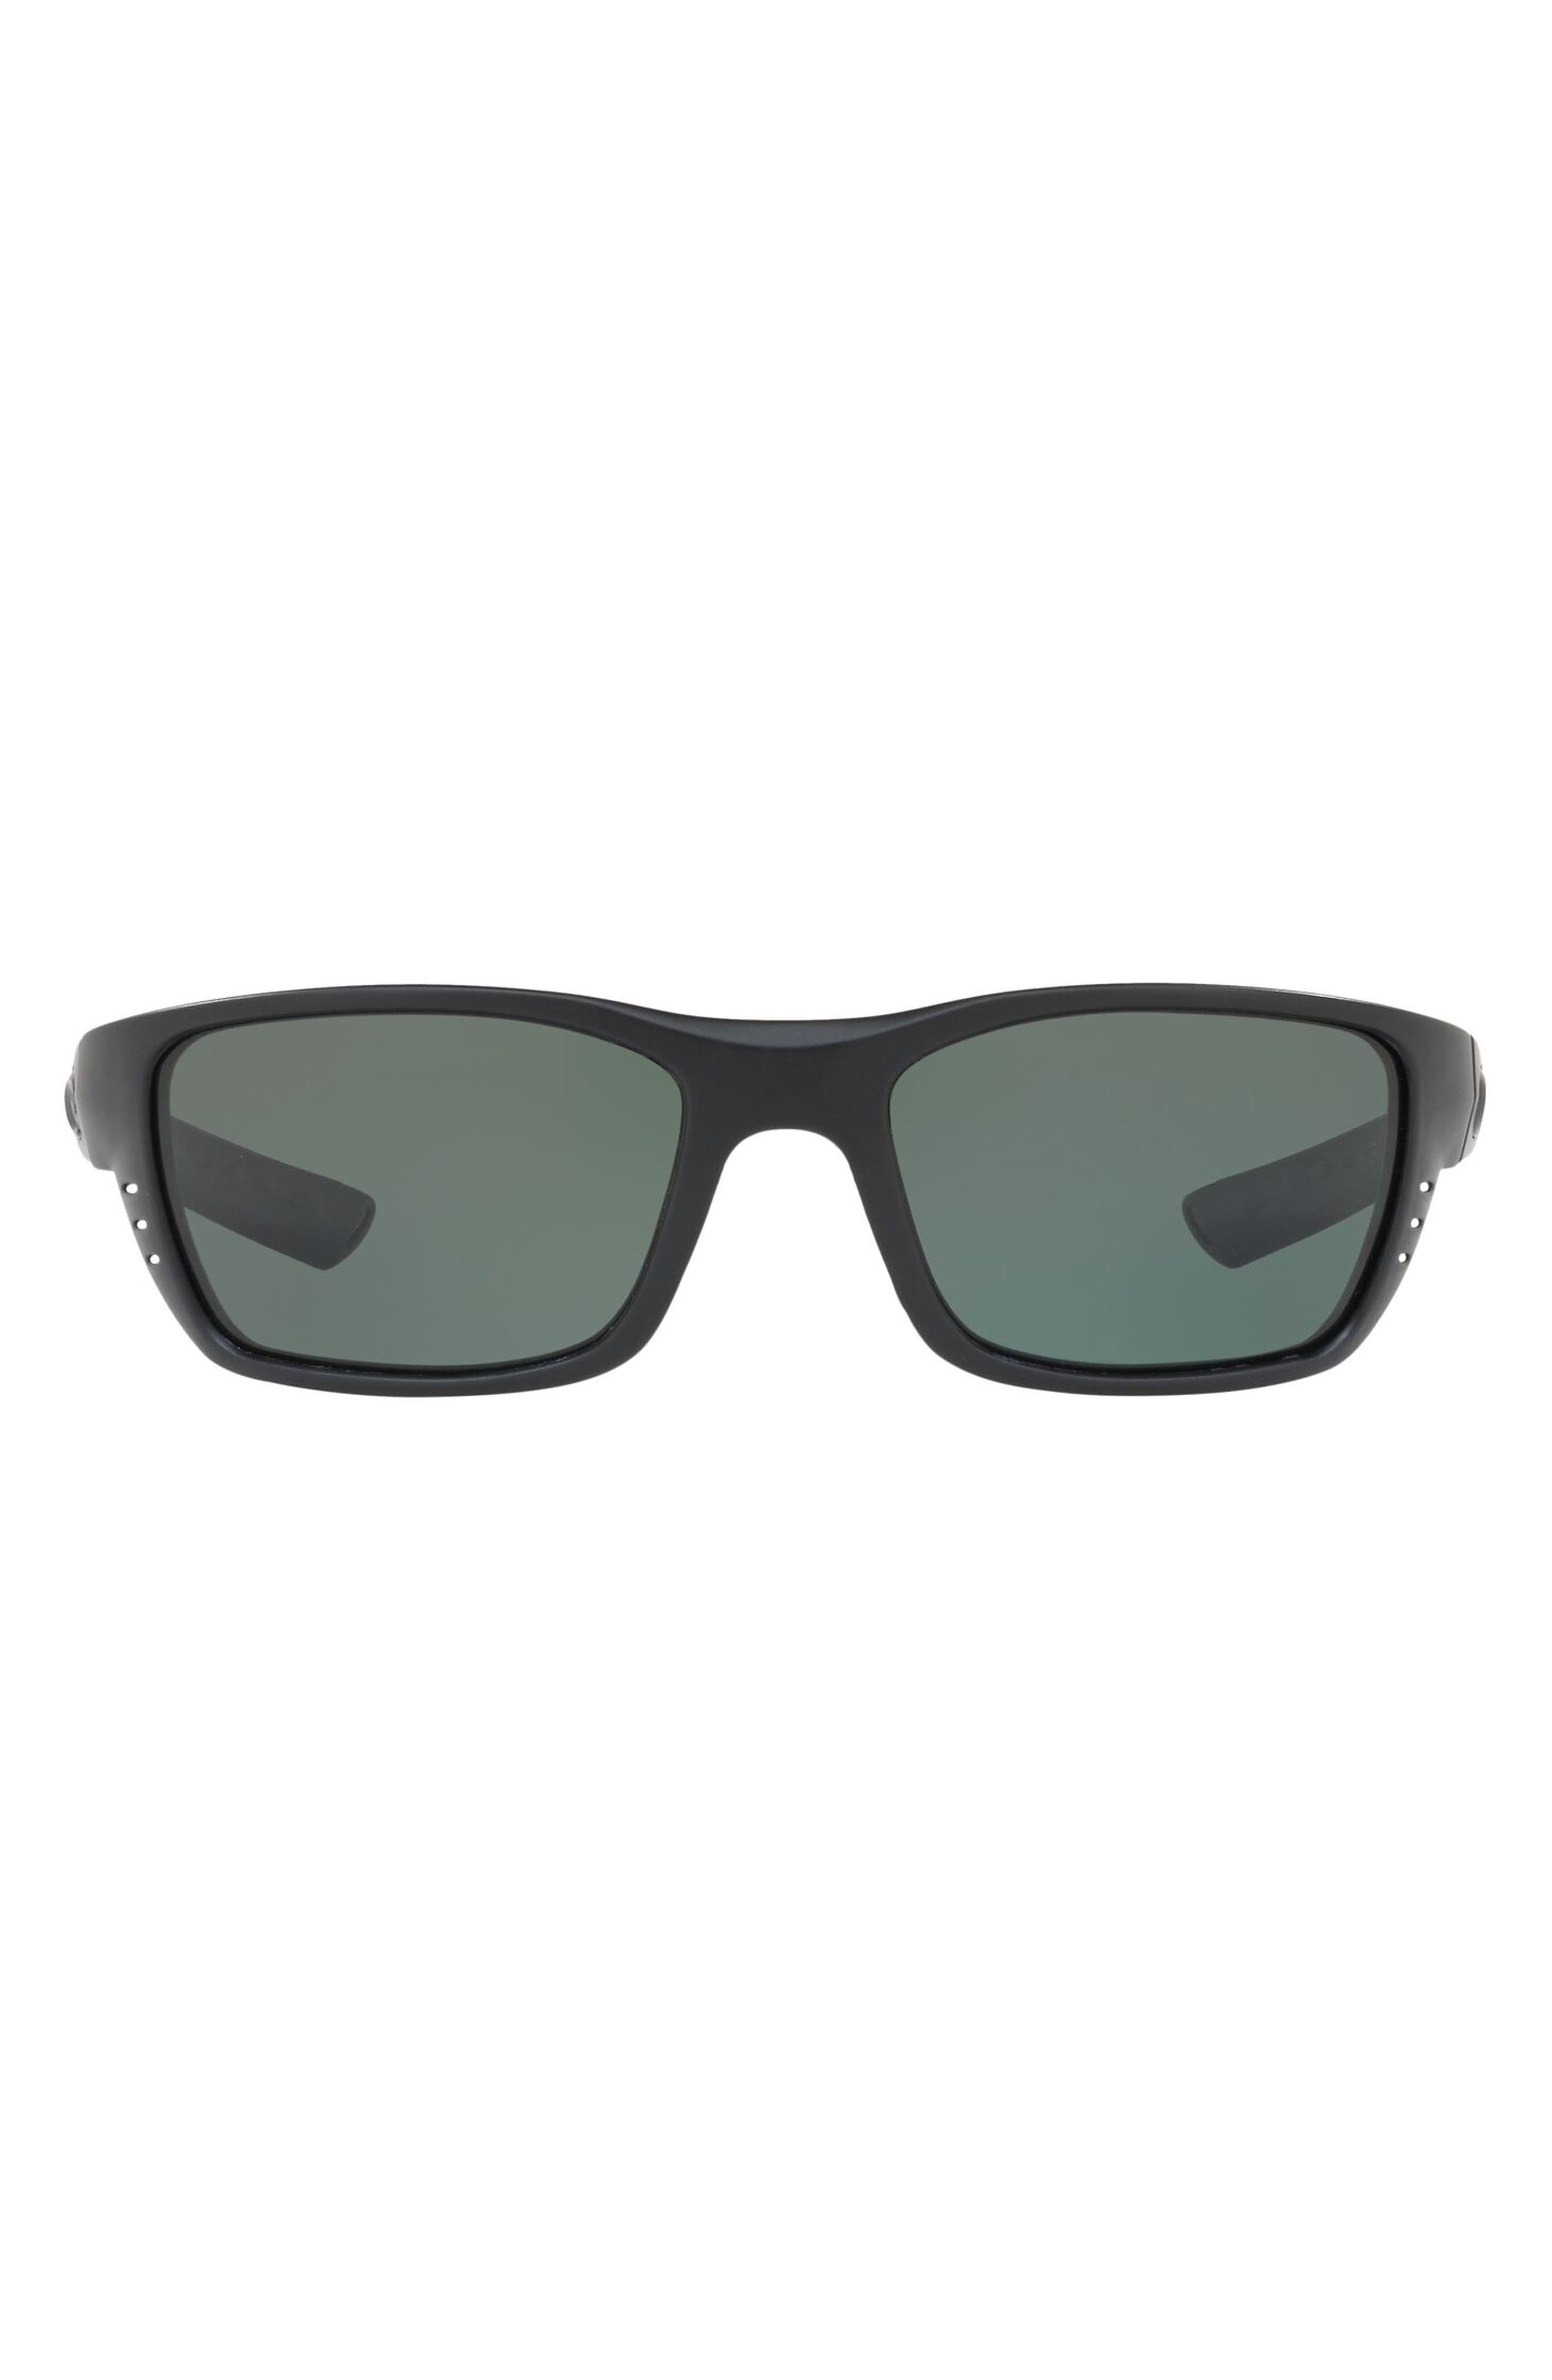 58mm Polarized Wraparound Sunglasses